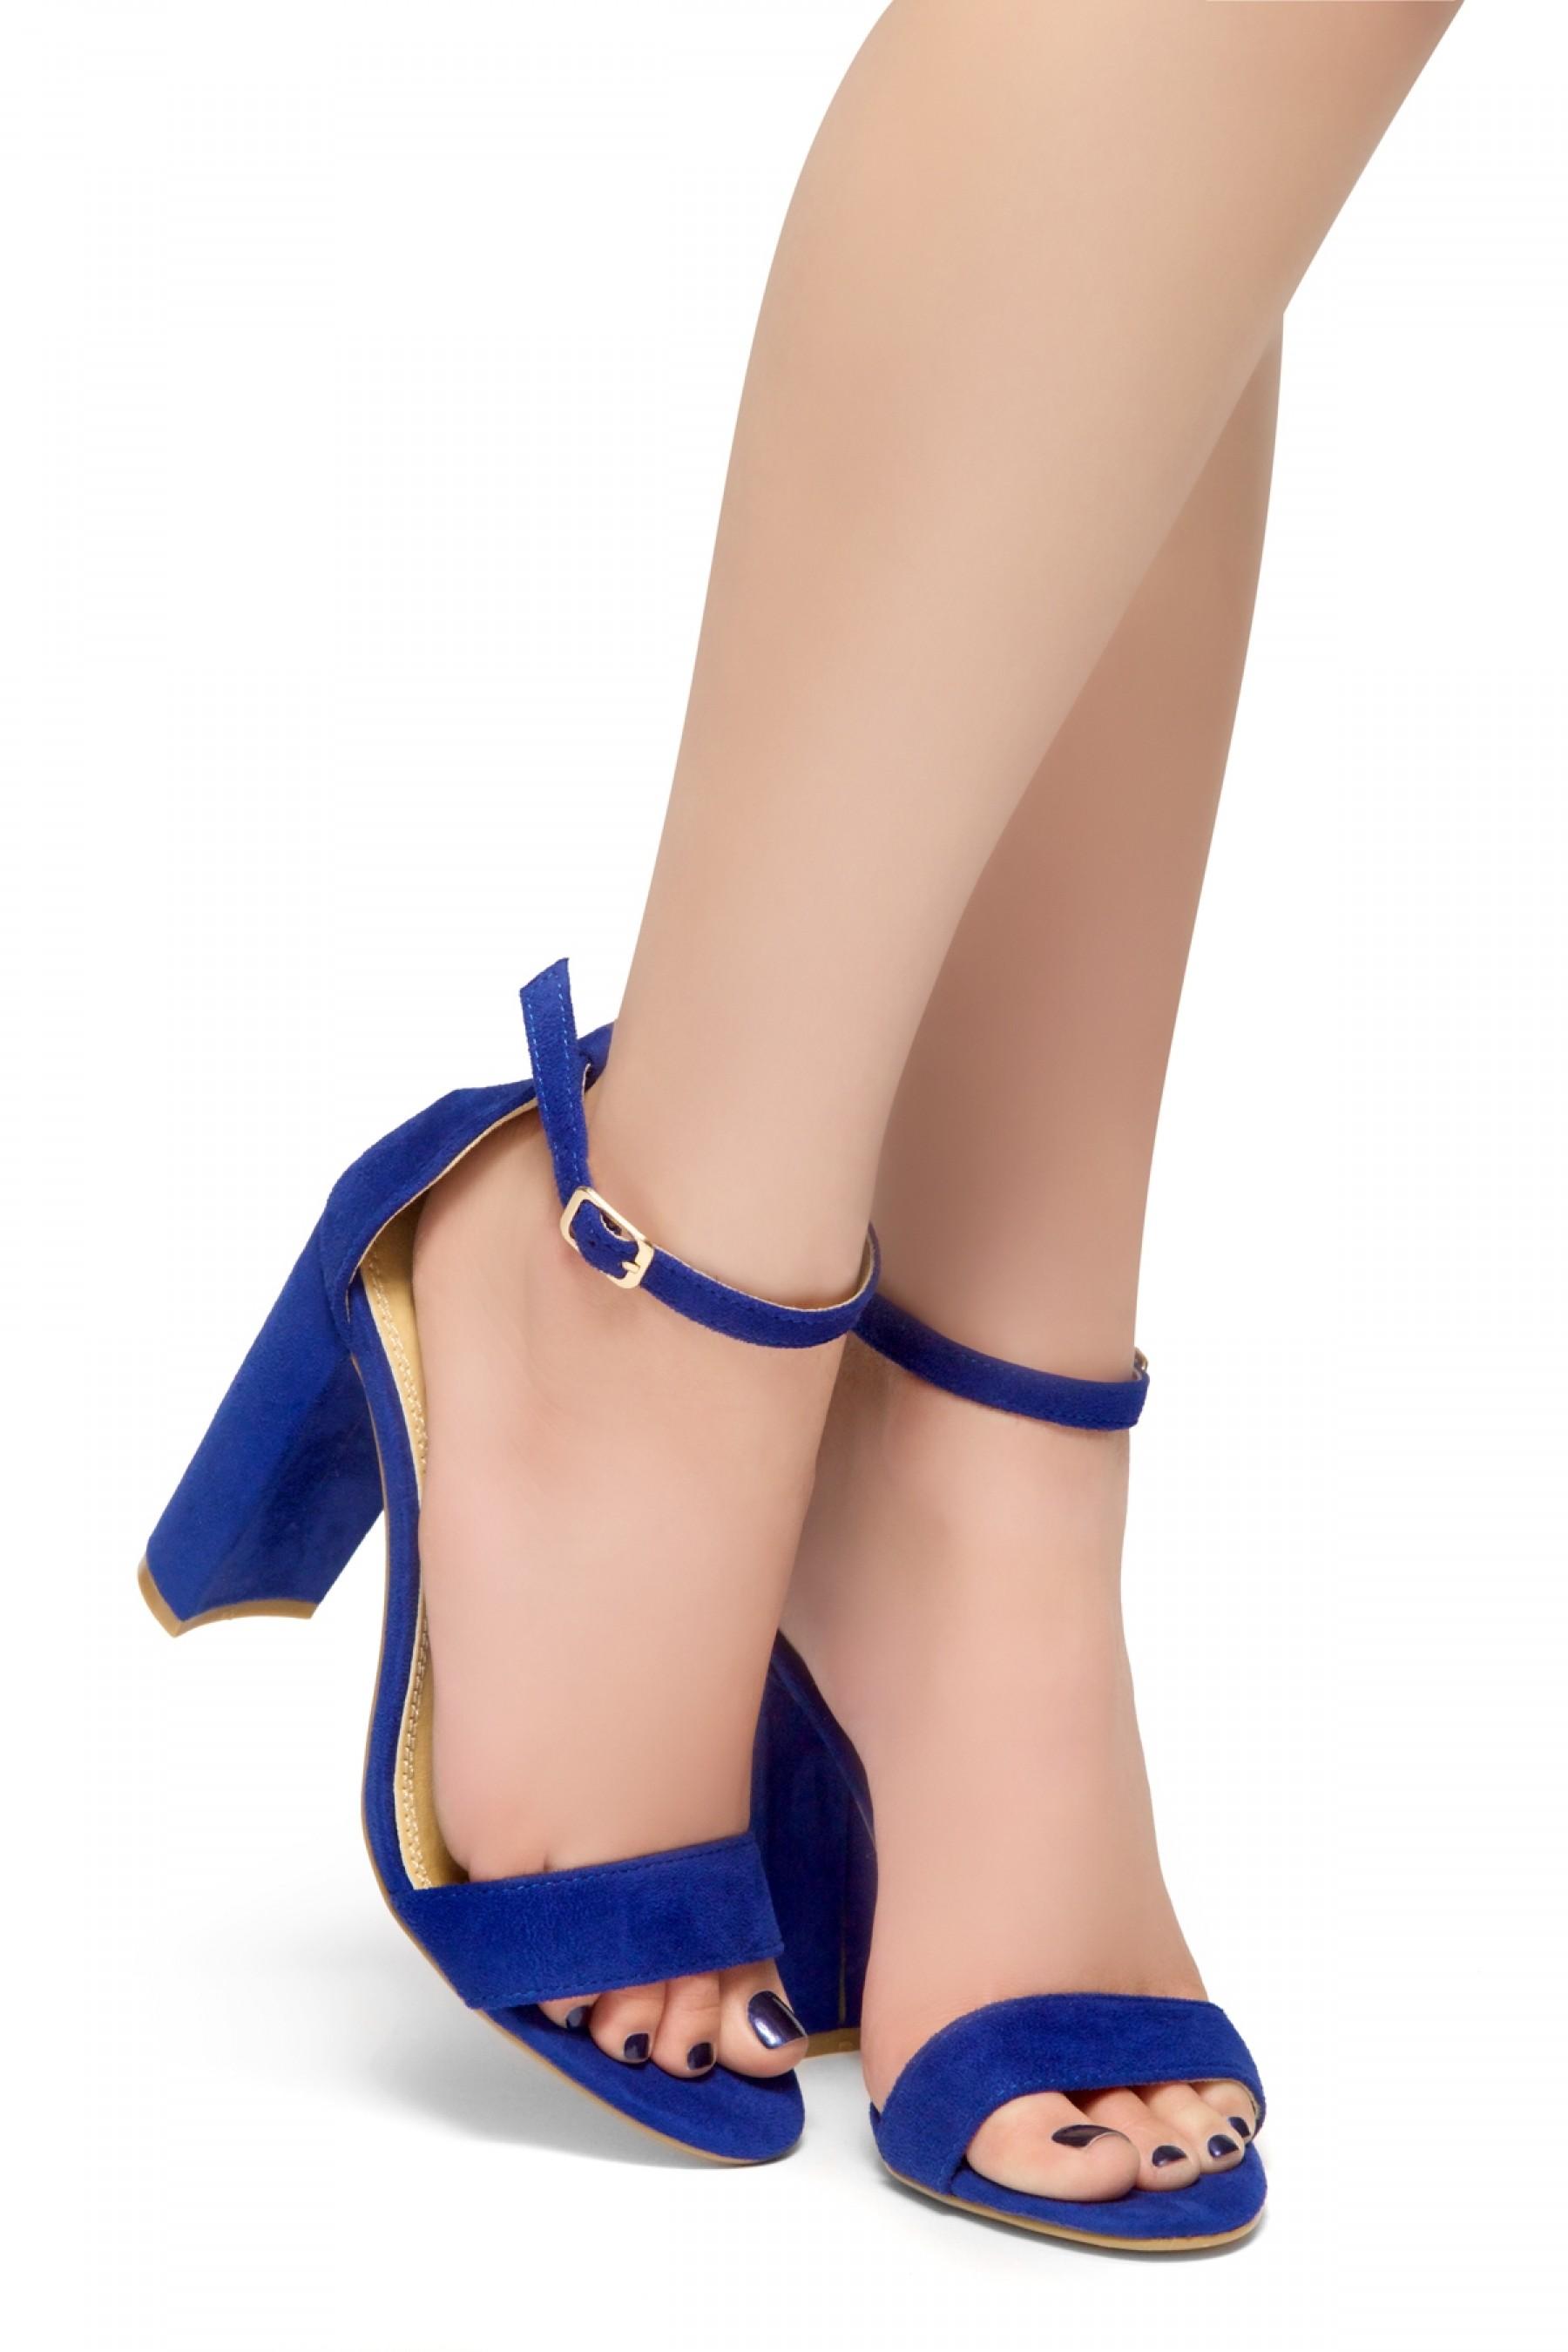 HerStyle Rosemmina Open Toe Ankle Strap Chunky Heel (Royal Blue)